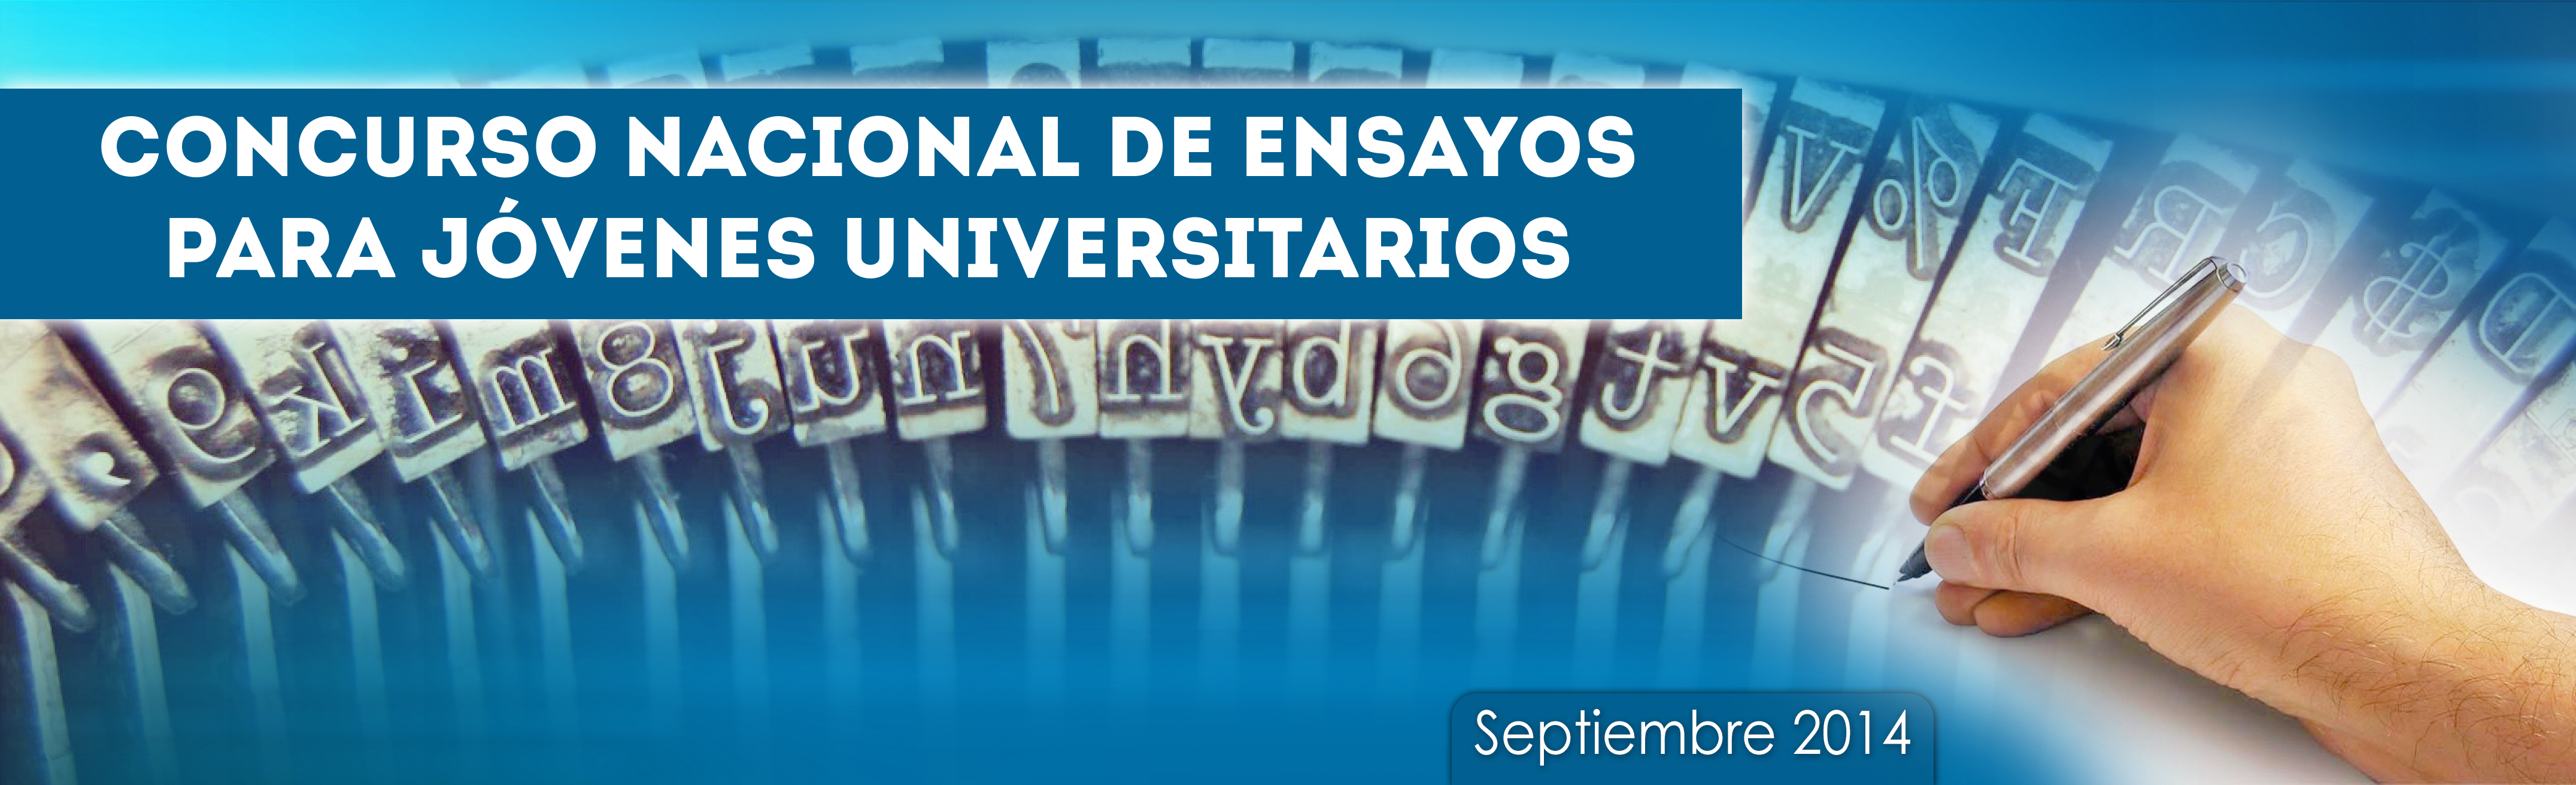 Banner-Ensayos1